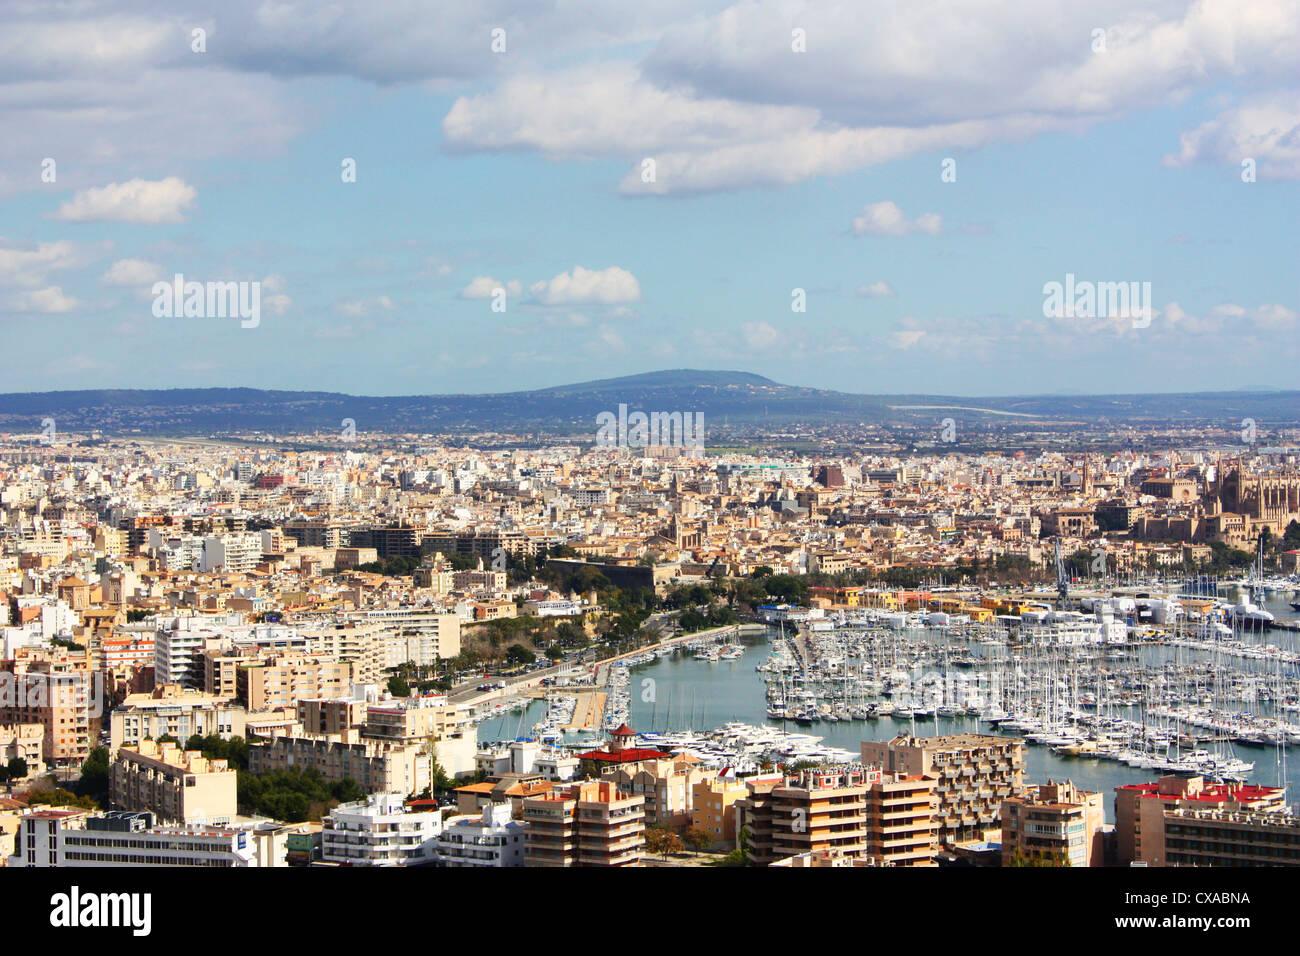 City view of Palma De Mallorca, Spain Stock Photo